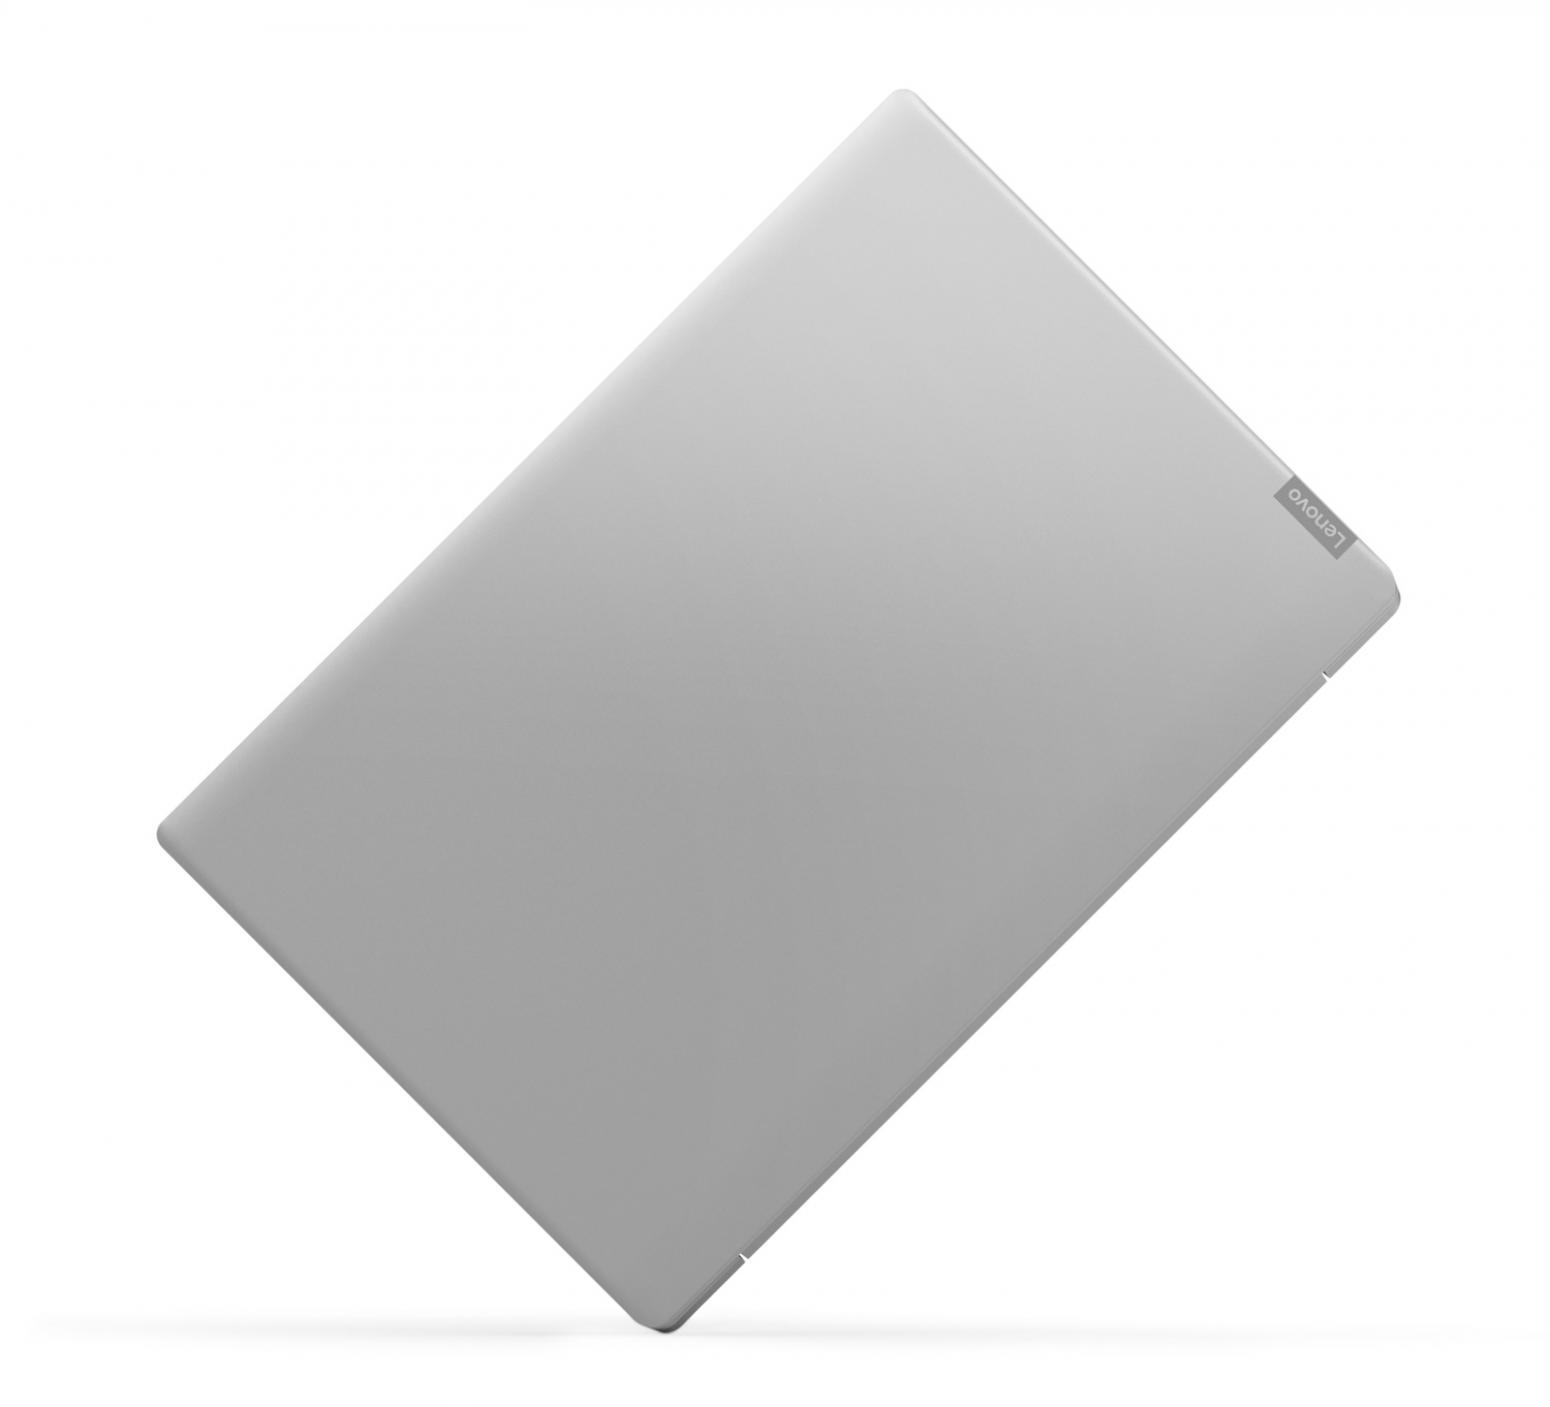 Ordinateur portable Lenovo IdeaPad 330S-15IKB (81F501ASFR) Argent - IPS, Kaby Refresh - photo 6